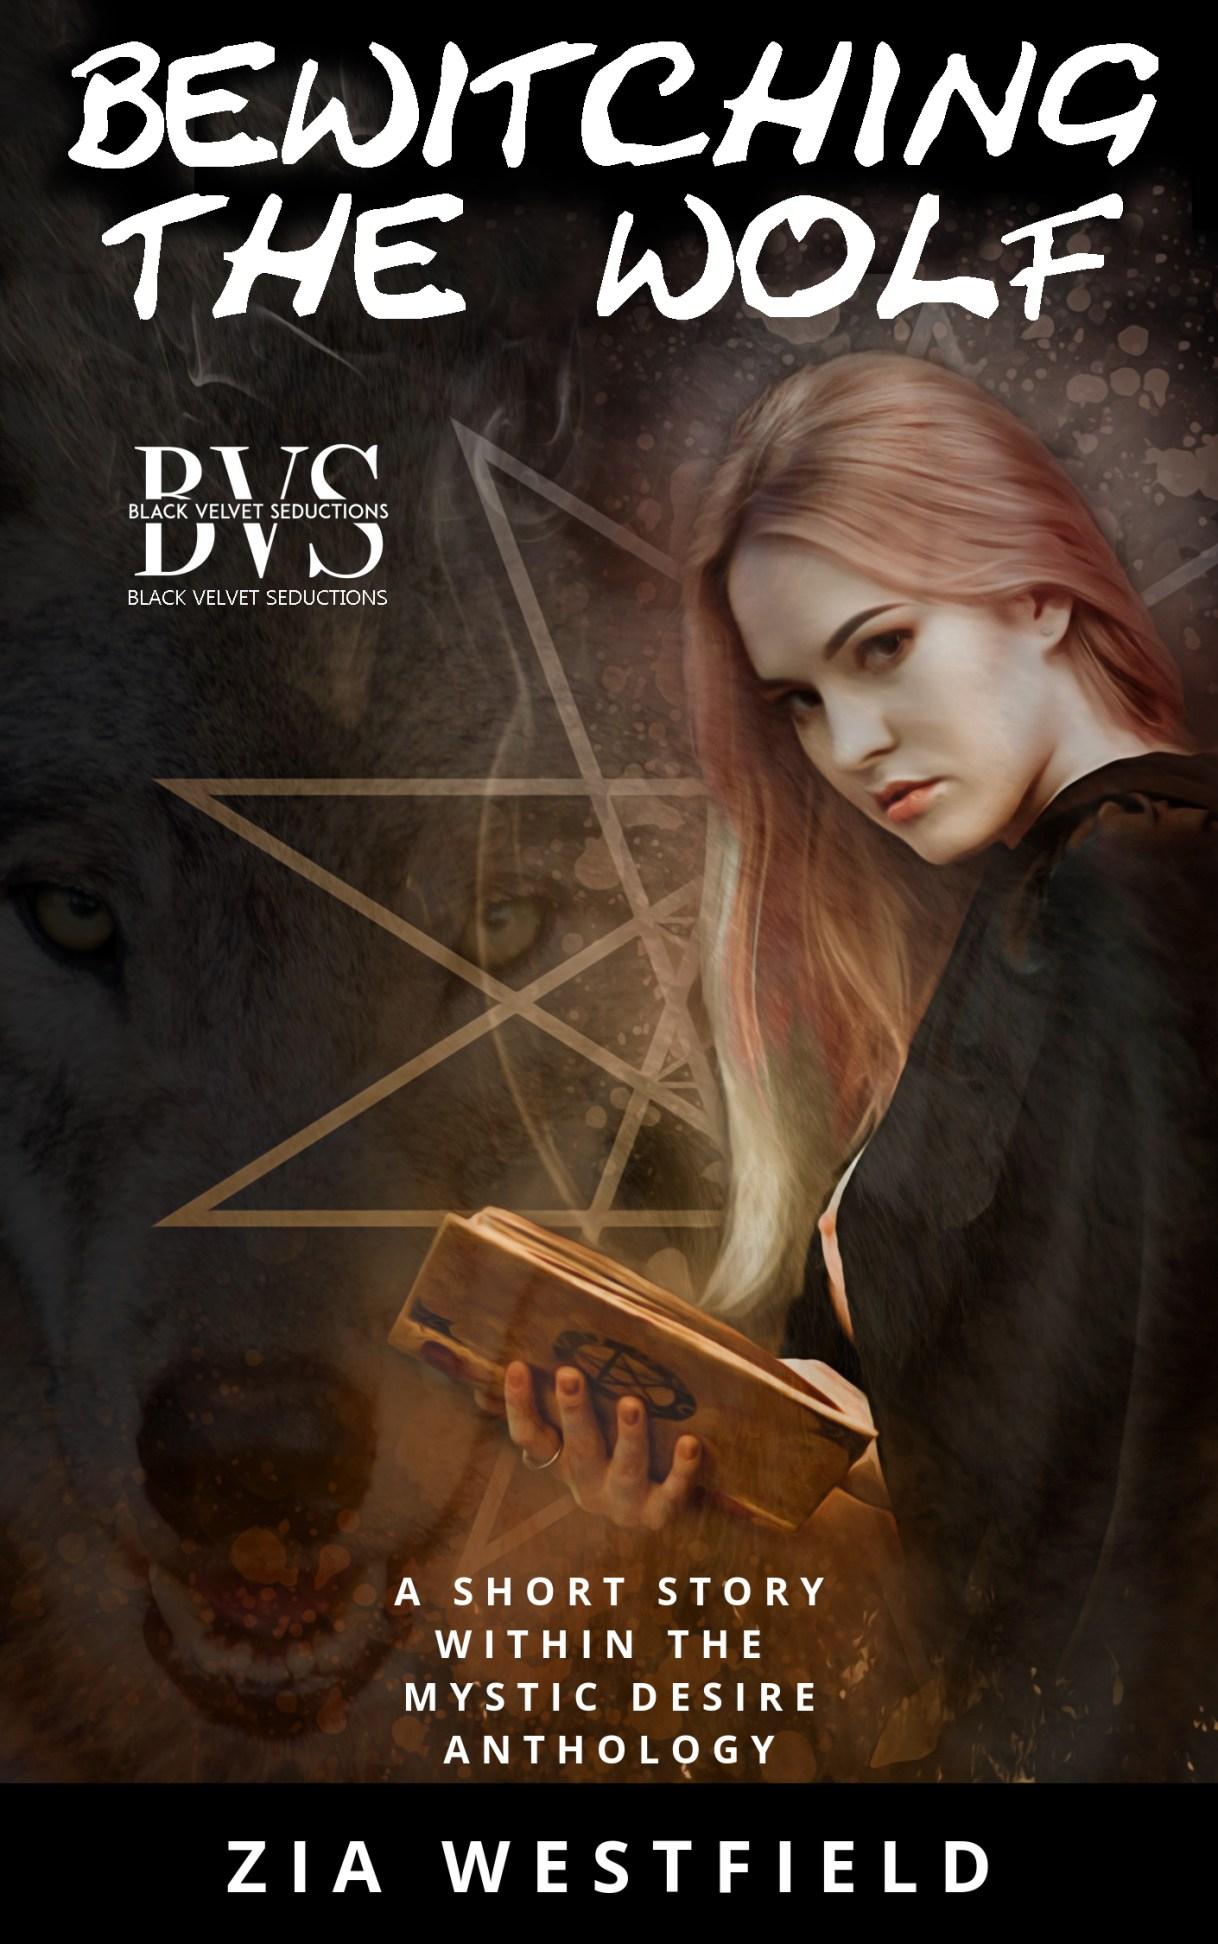 Zia Westfield Mystic Desire #blackvelvetseductions #coverreveal #bvsbooks #altread #supernatural #anthology #halloween